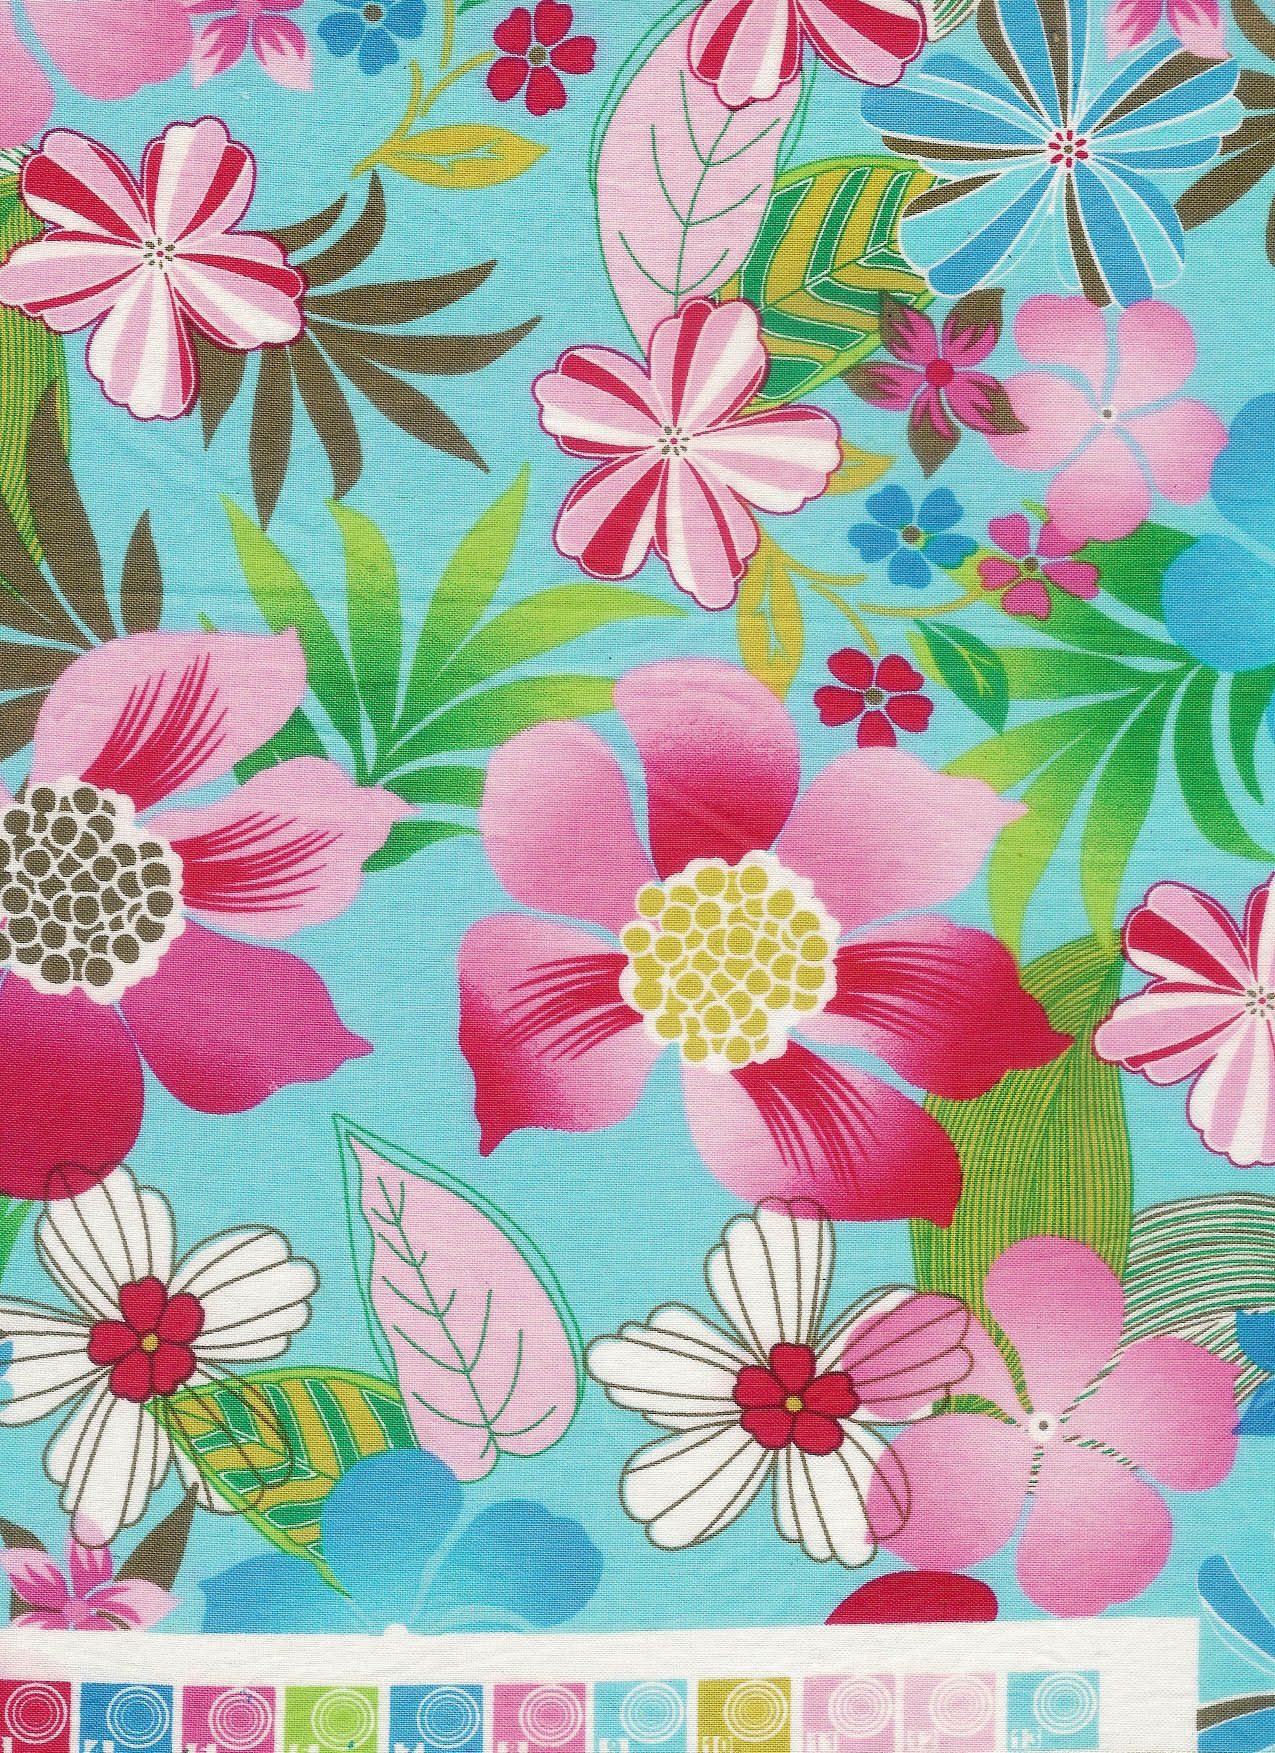 Pink and turquoise hawaiian flowers bedding surferbedding pink and turquoise hawaiian flowers bedding surferbedding hawaiian and surfer inspired izmirmasajfo Images